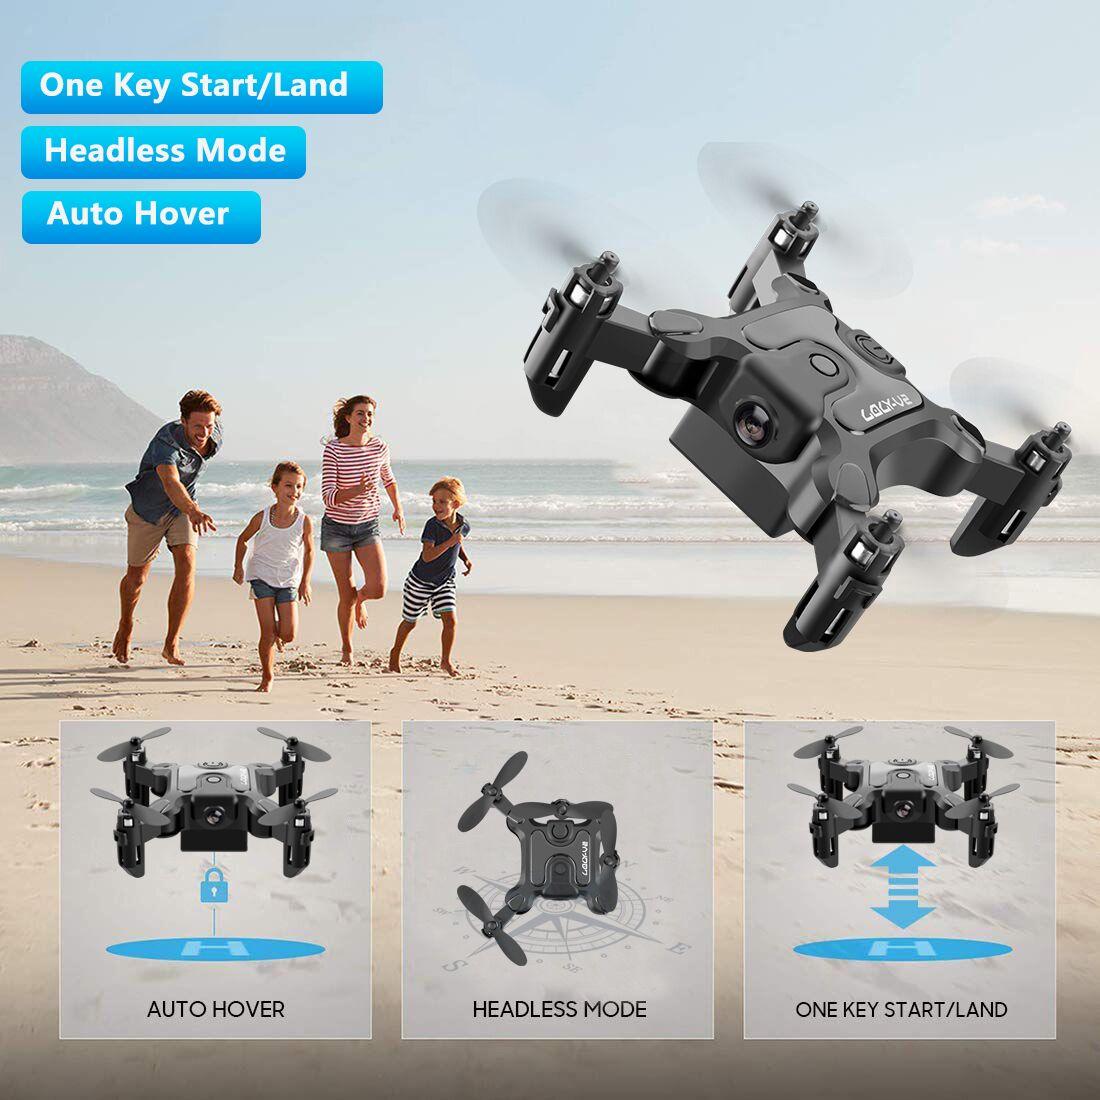 New Mini Drone V2 1080P HD Camera WiFi Fpv Air Pressure Altitude Hold Foldable Quadcopter RC Drone Kid Toy GIft 3